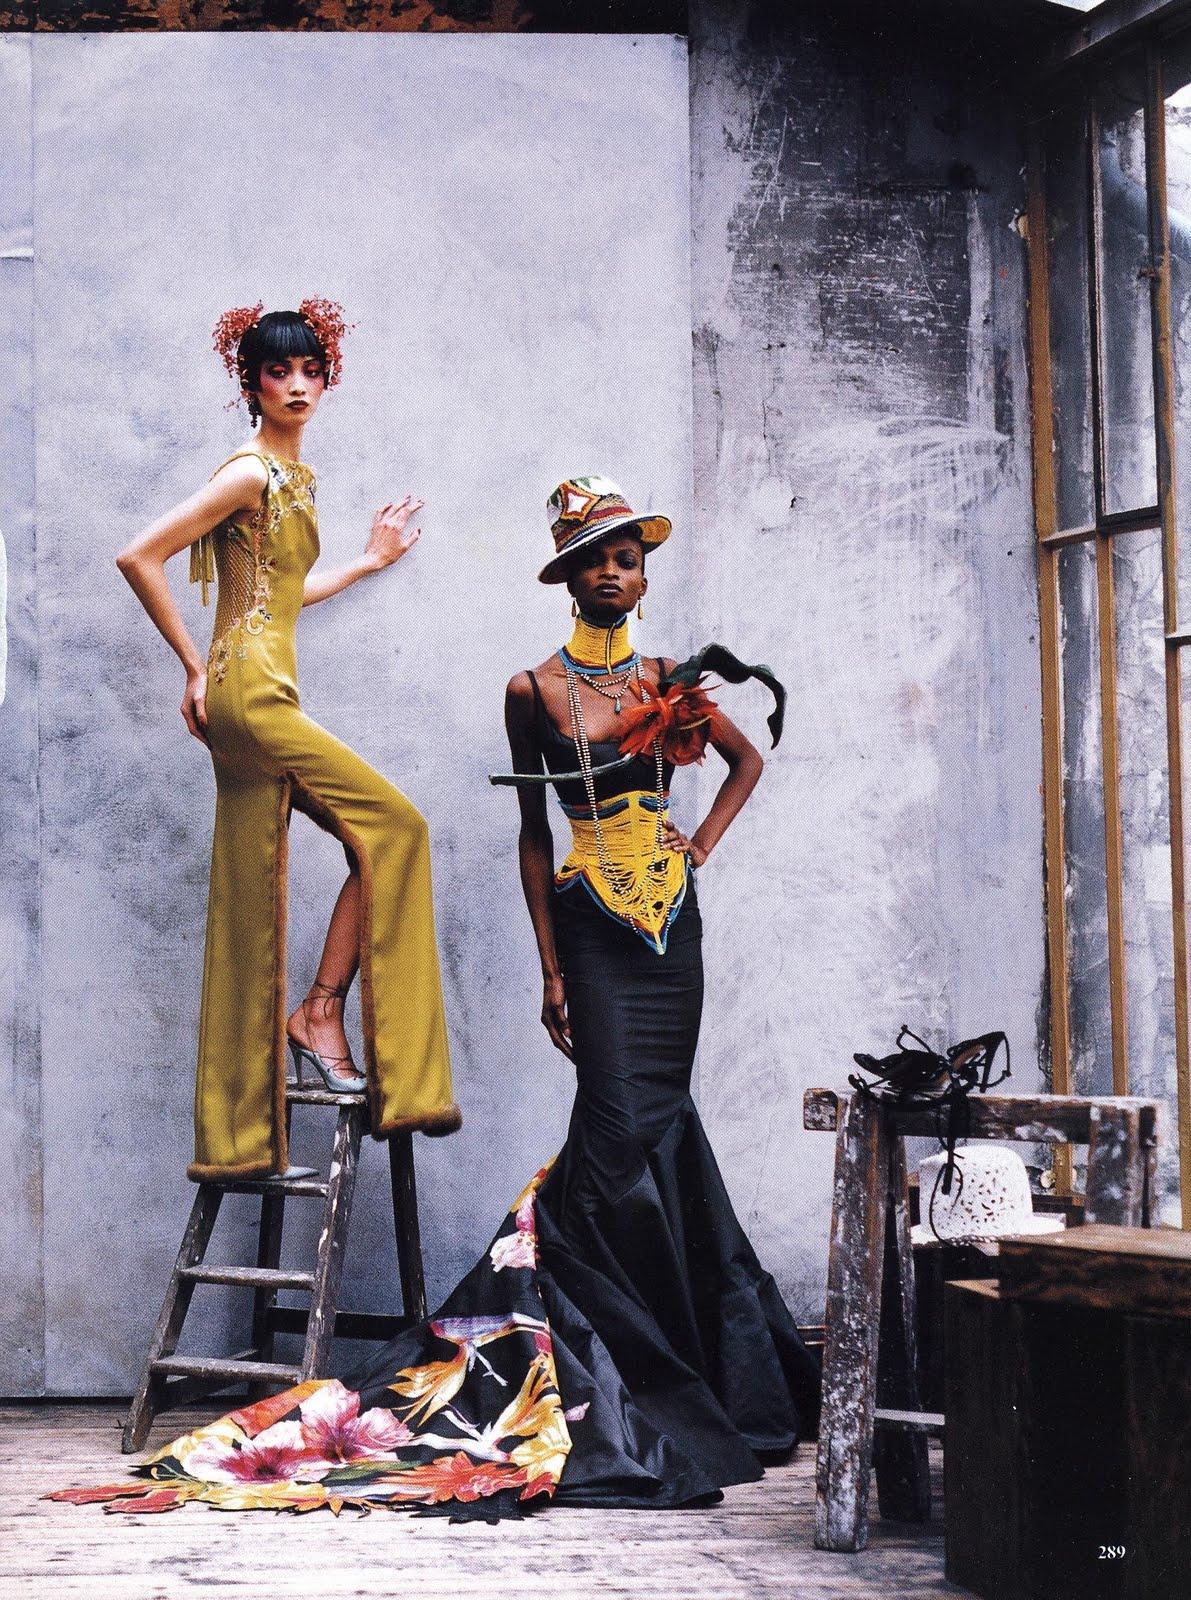 http://1.bp.blogspot.com/_m_3PqTnwV8k/TBV7sOFVGfI/AAAAAAAAPso/DWCjcxXPvac/s1600/Ling+Tan+-+US+Vogue+-+1.jpg